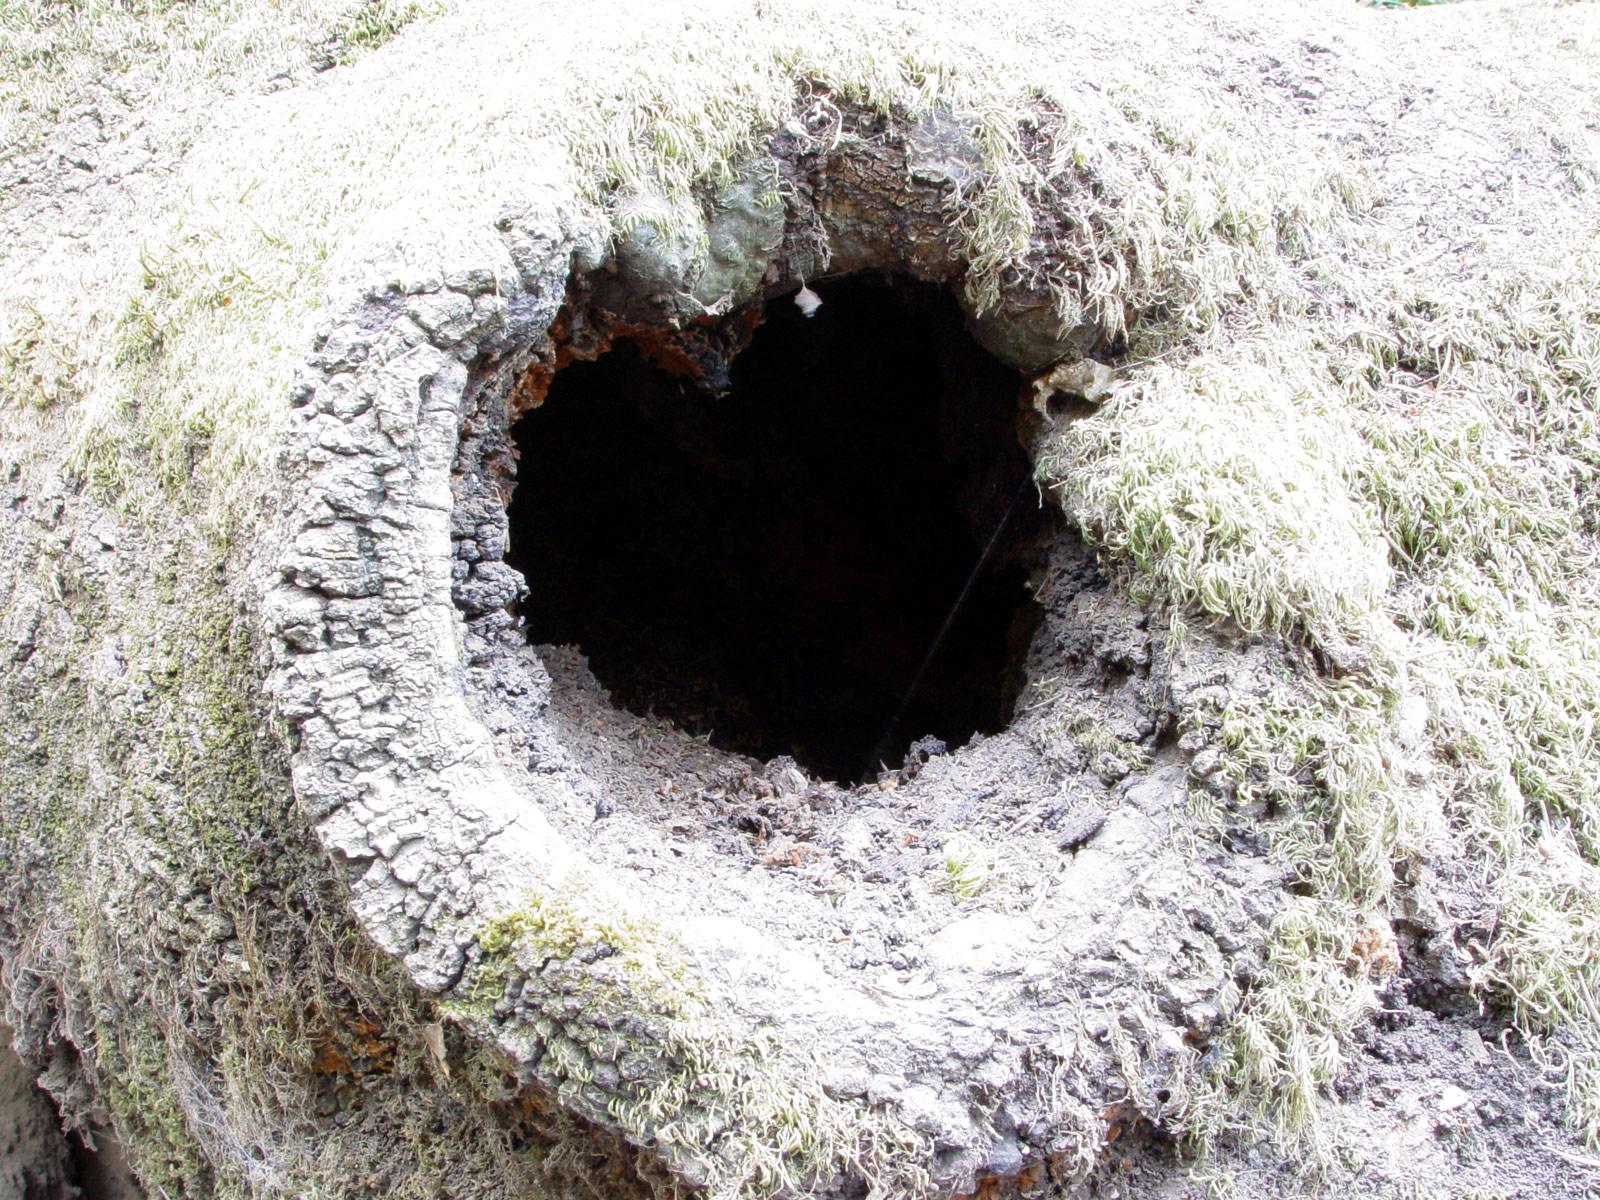 nicolaswill hollow tree black hole trunk moss